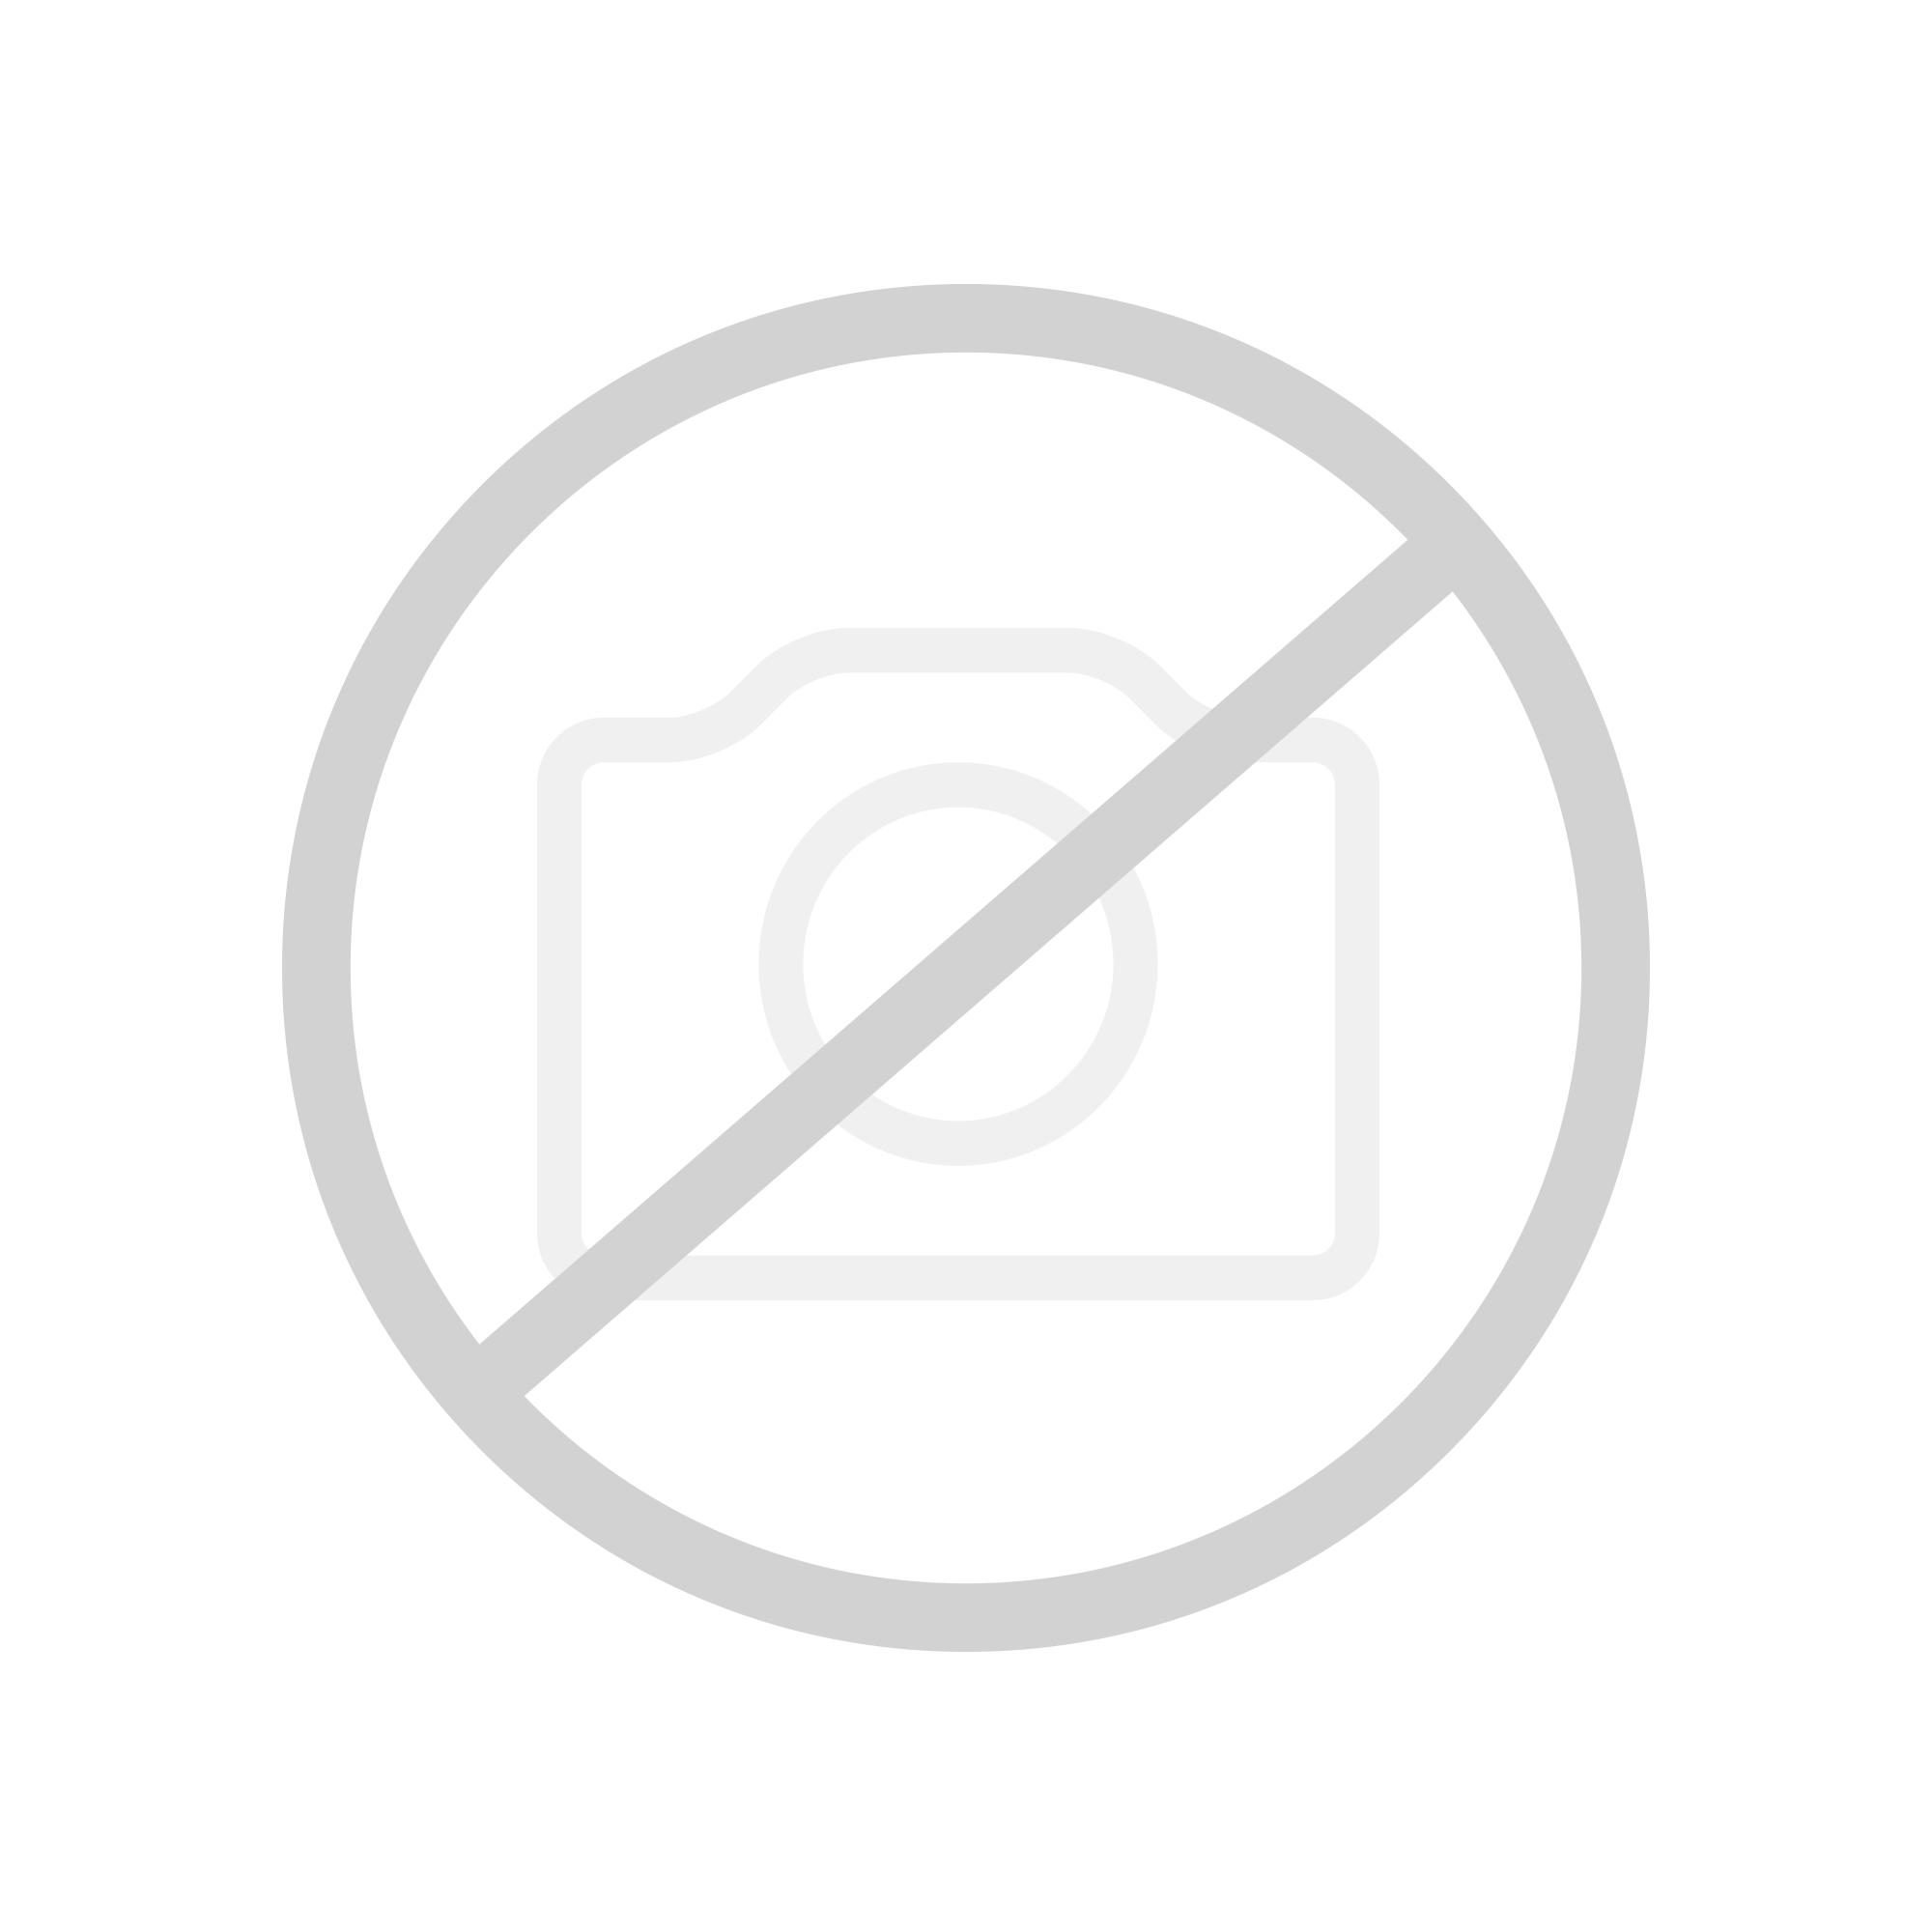 Hansa Hansasmartshower multifunktionales Wellness-Duschsystem DN 15